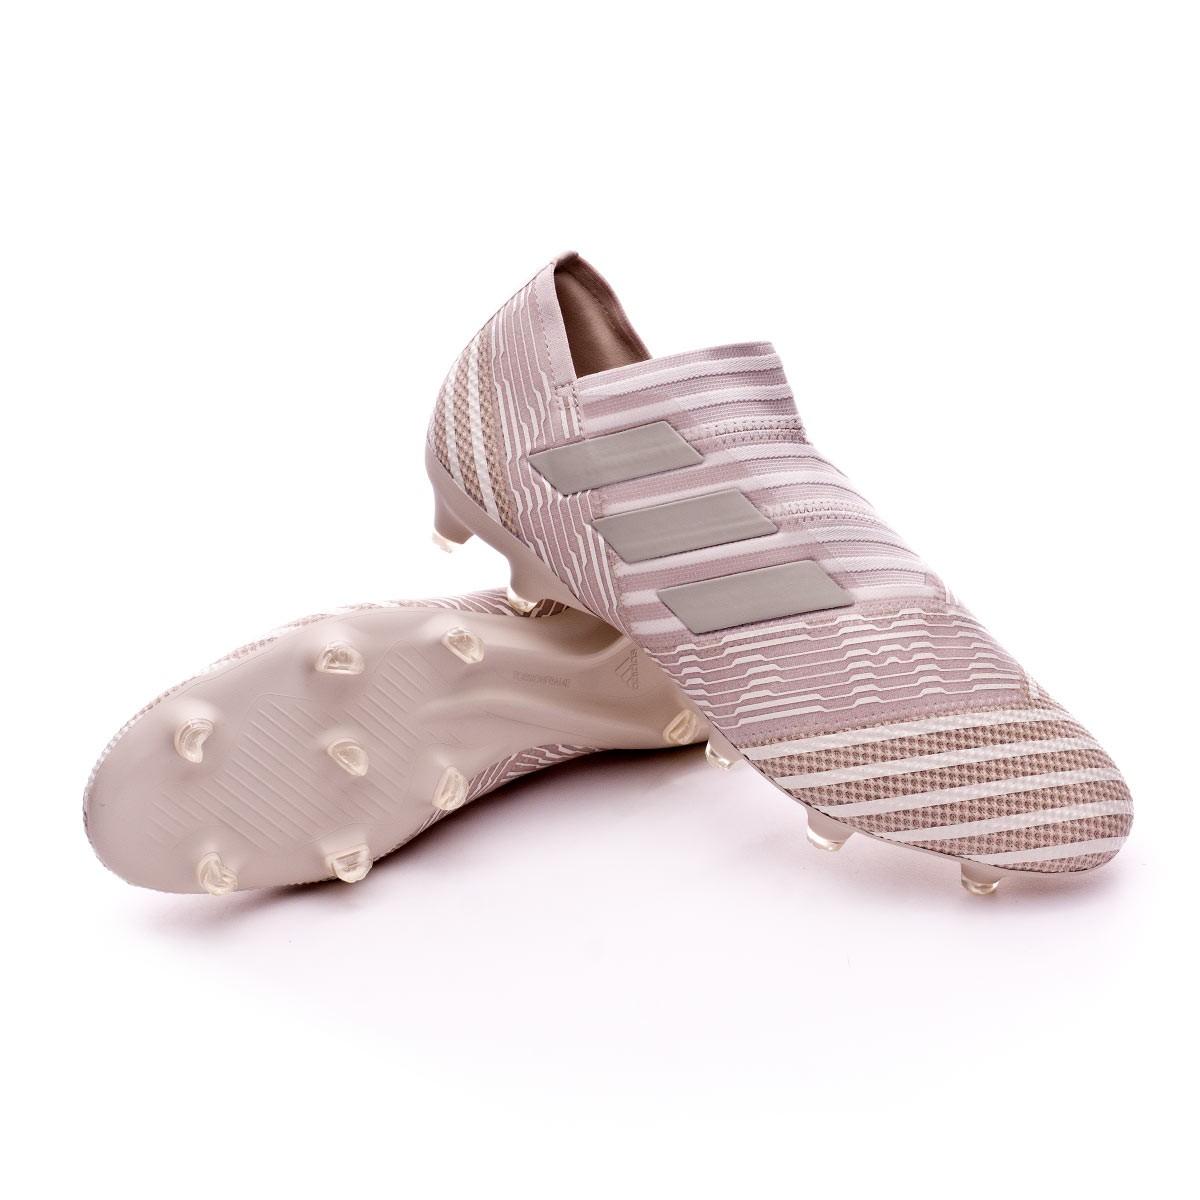 384068d6af8f adidas Nemeziz 17+ 360 Agility FG Football Boots. Clear Brown-Sesame-Chalk  ...